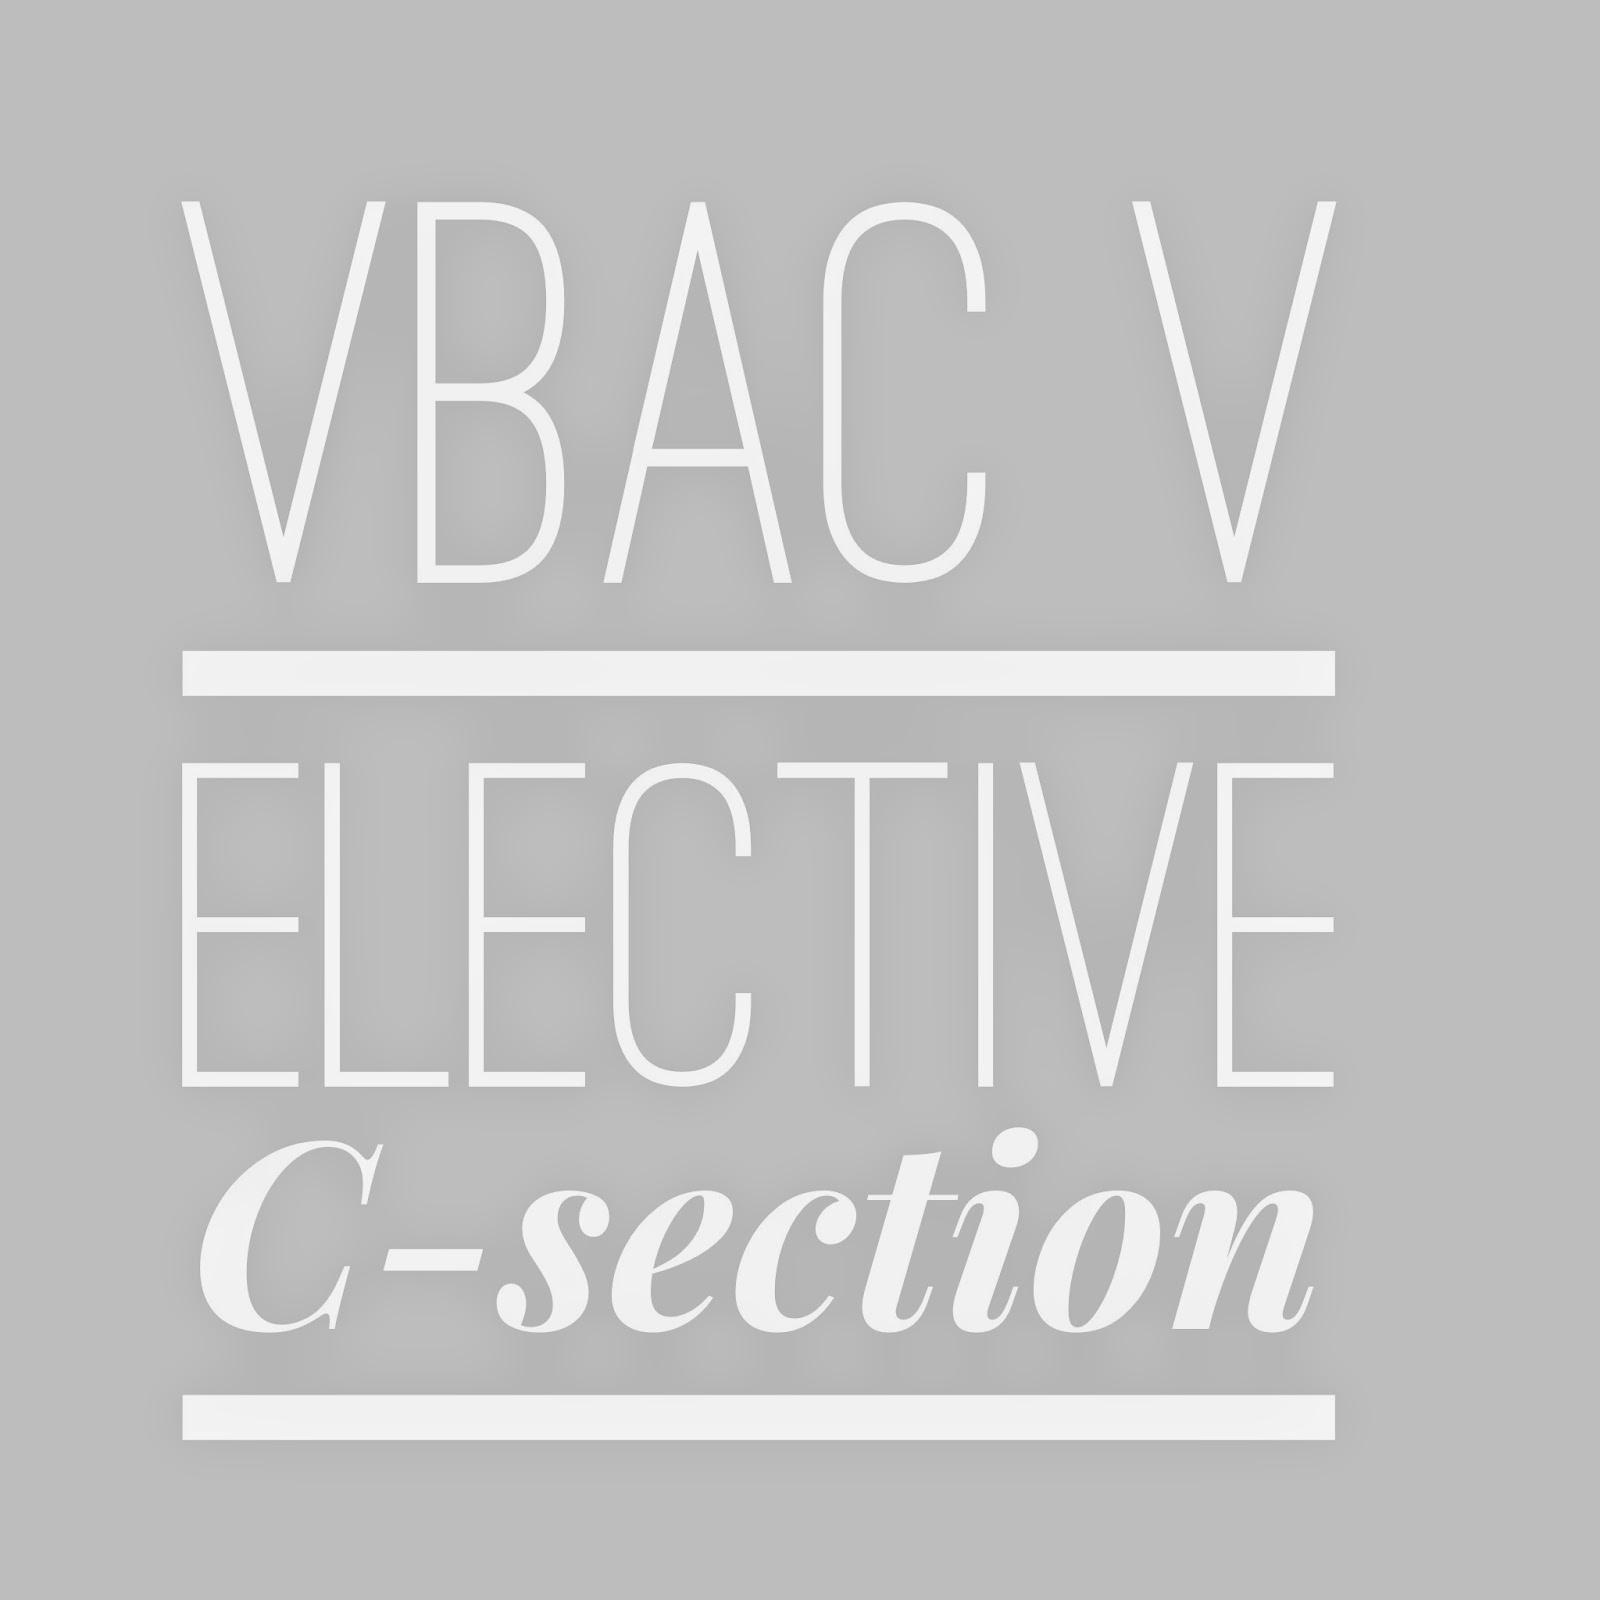 Vbac V Elective C Section